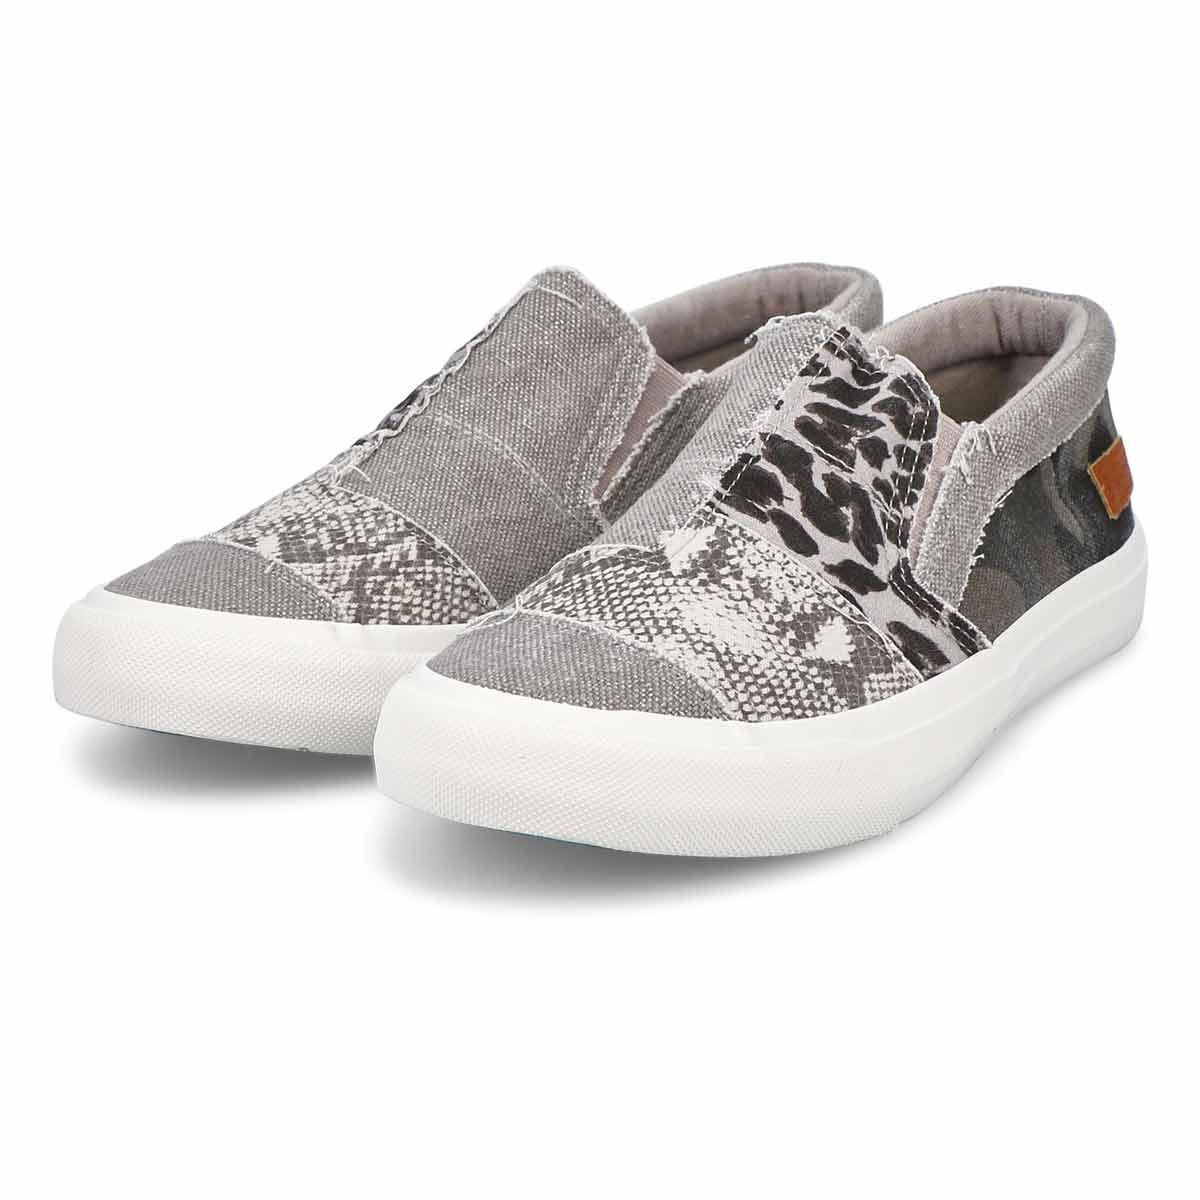 Women's Maddox Fashion Sneaker - Smoke